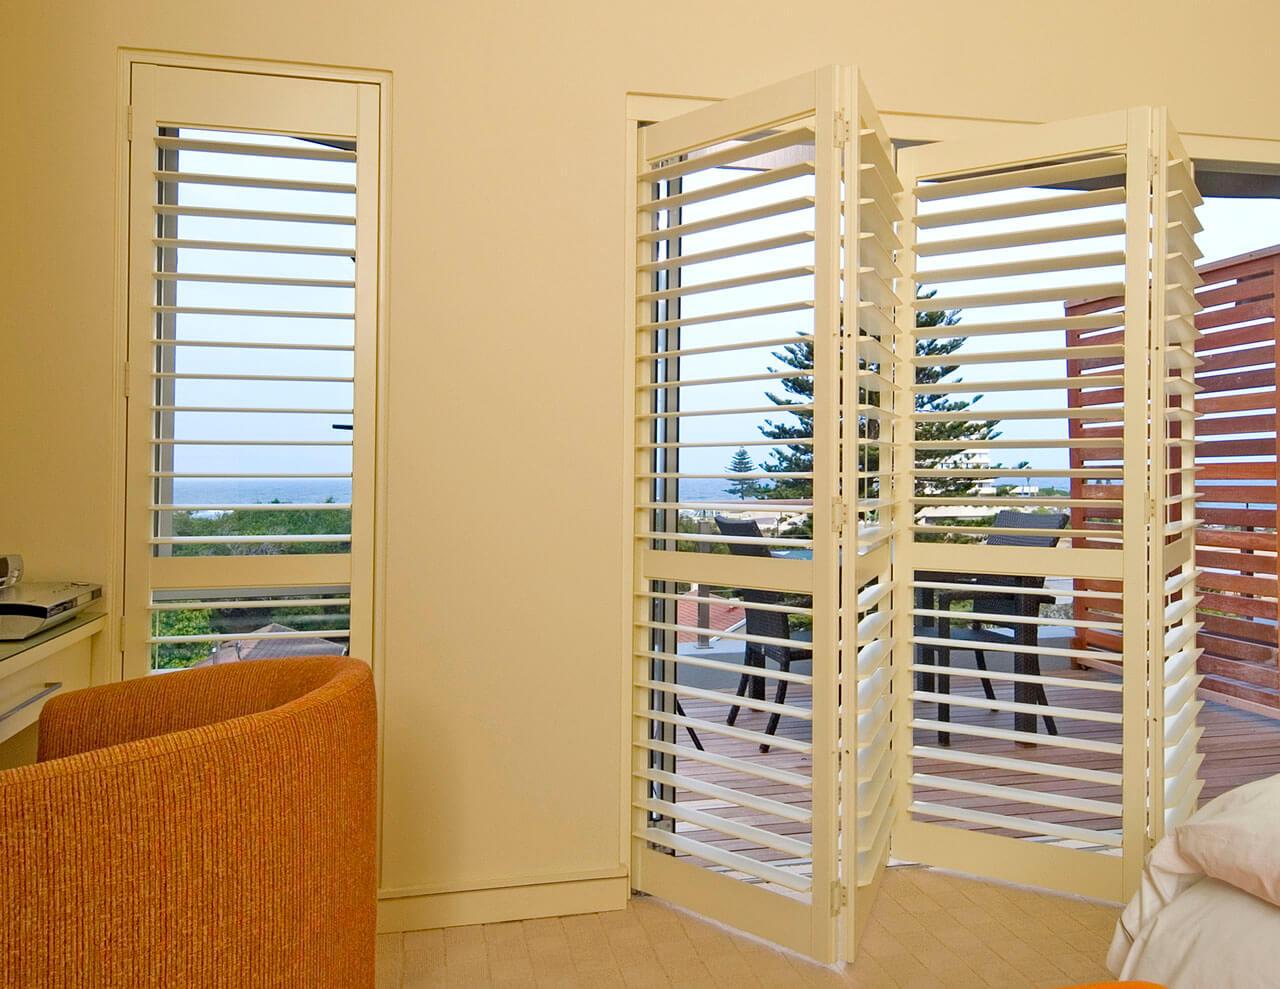 Plantation Shutters For Sliding Doors At Home Complete Blinds